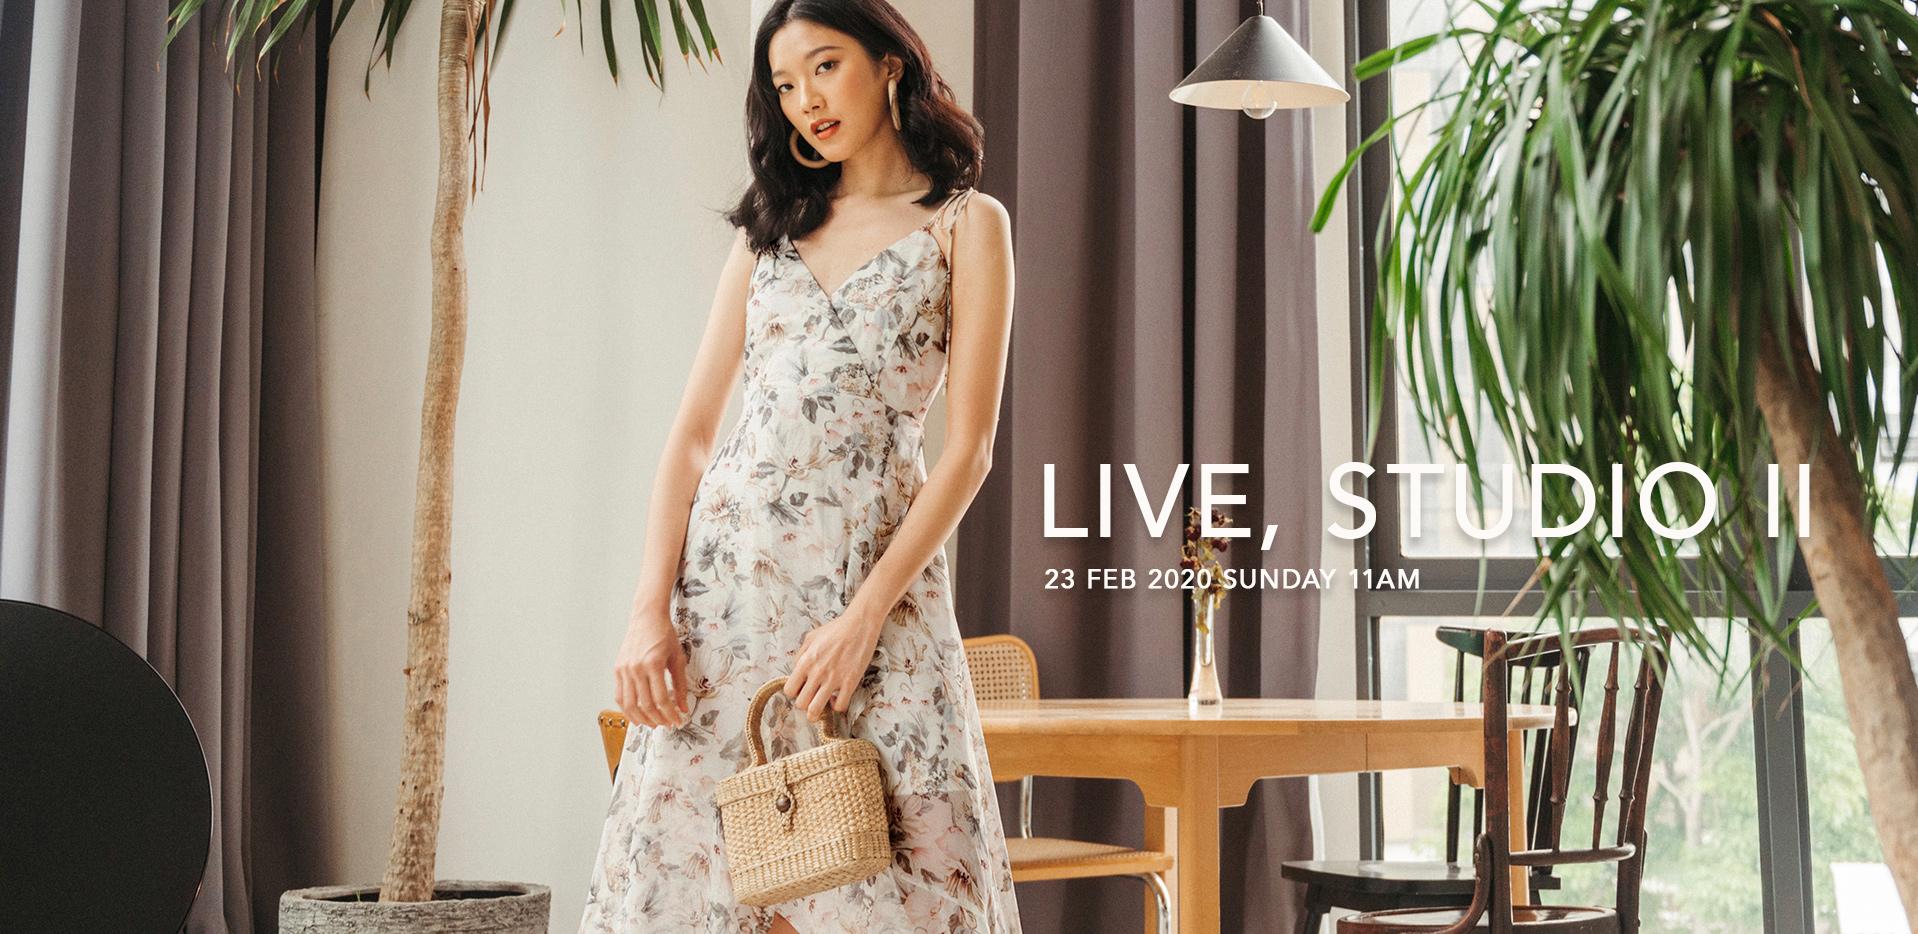 LIVE, STUDIO II